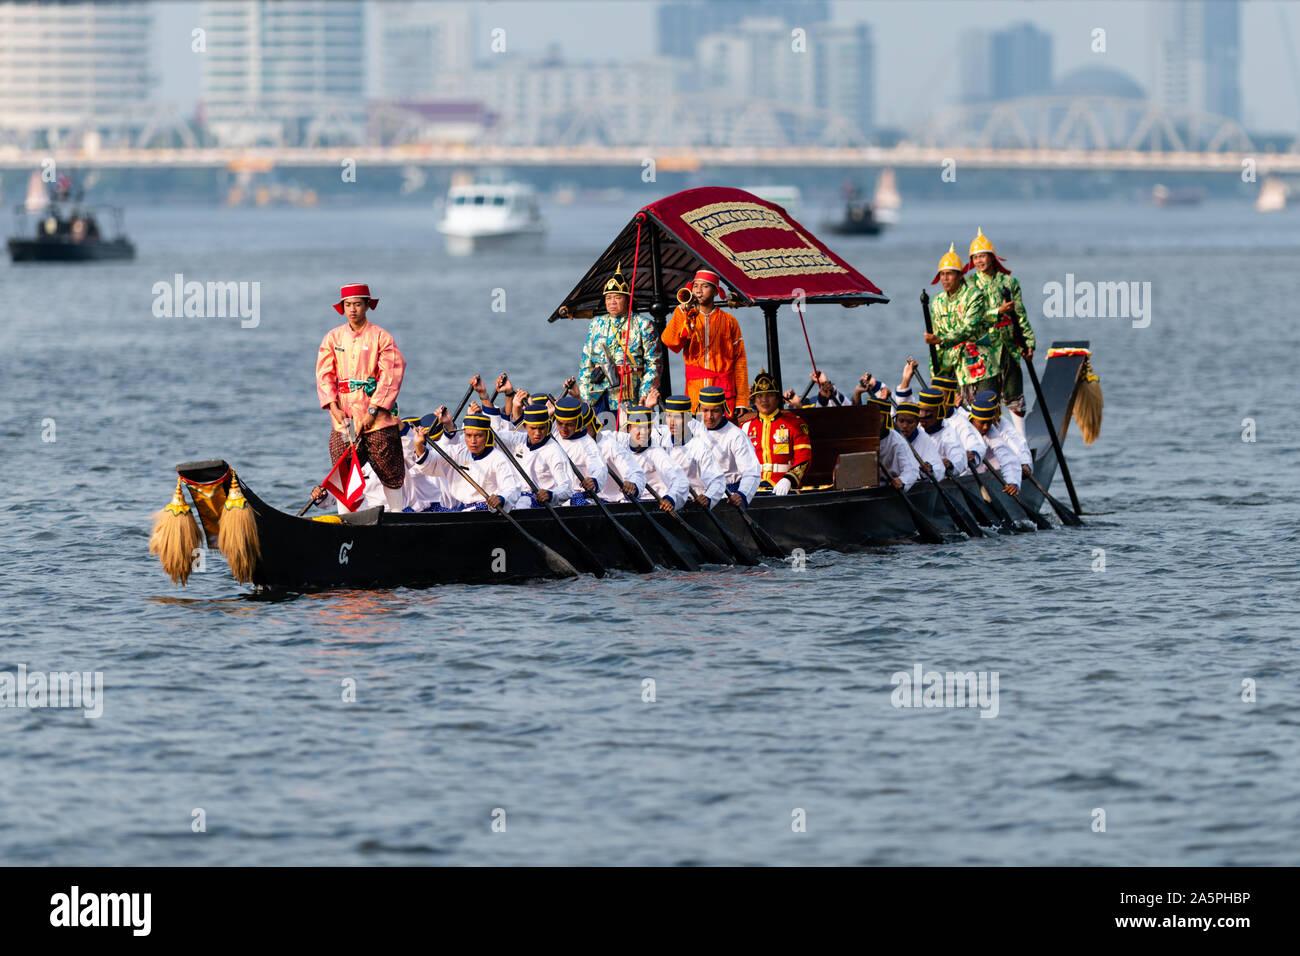 Bangkok, Thailand - October 21, 2019: Thai  royal barges participate in a procession on Bangkok's Chao Phraya River. Stock Photo